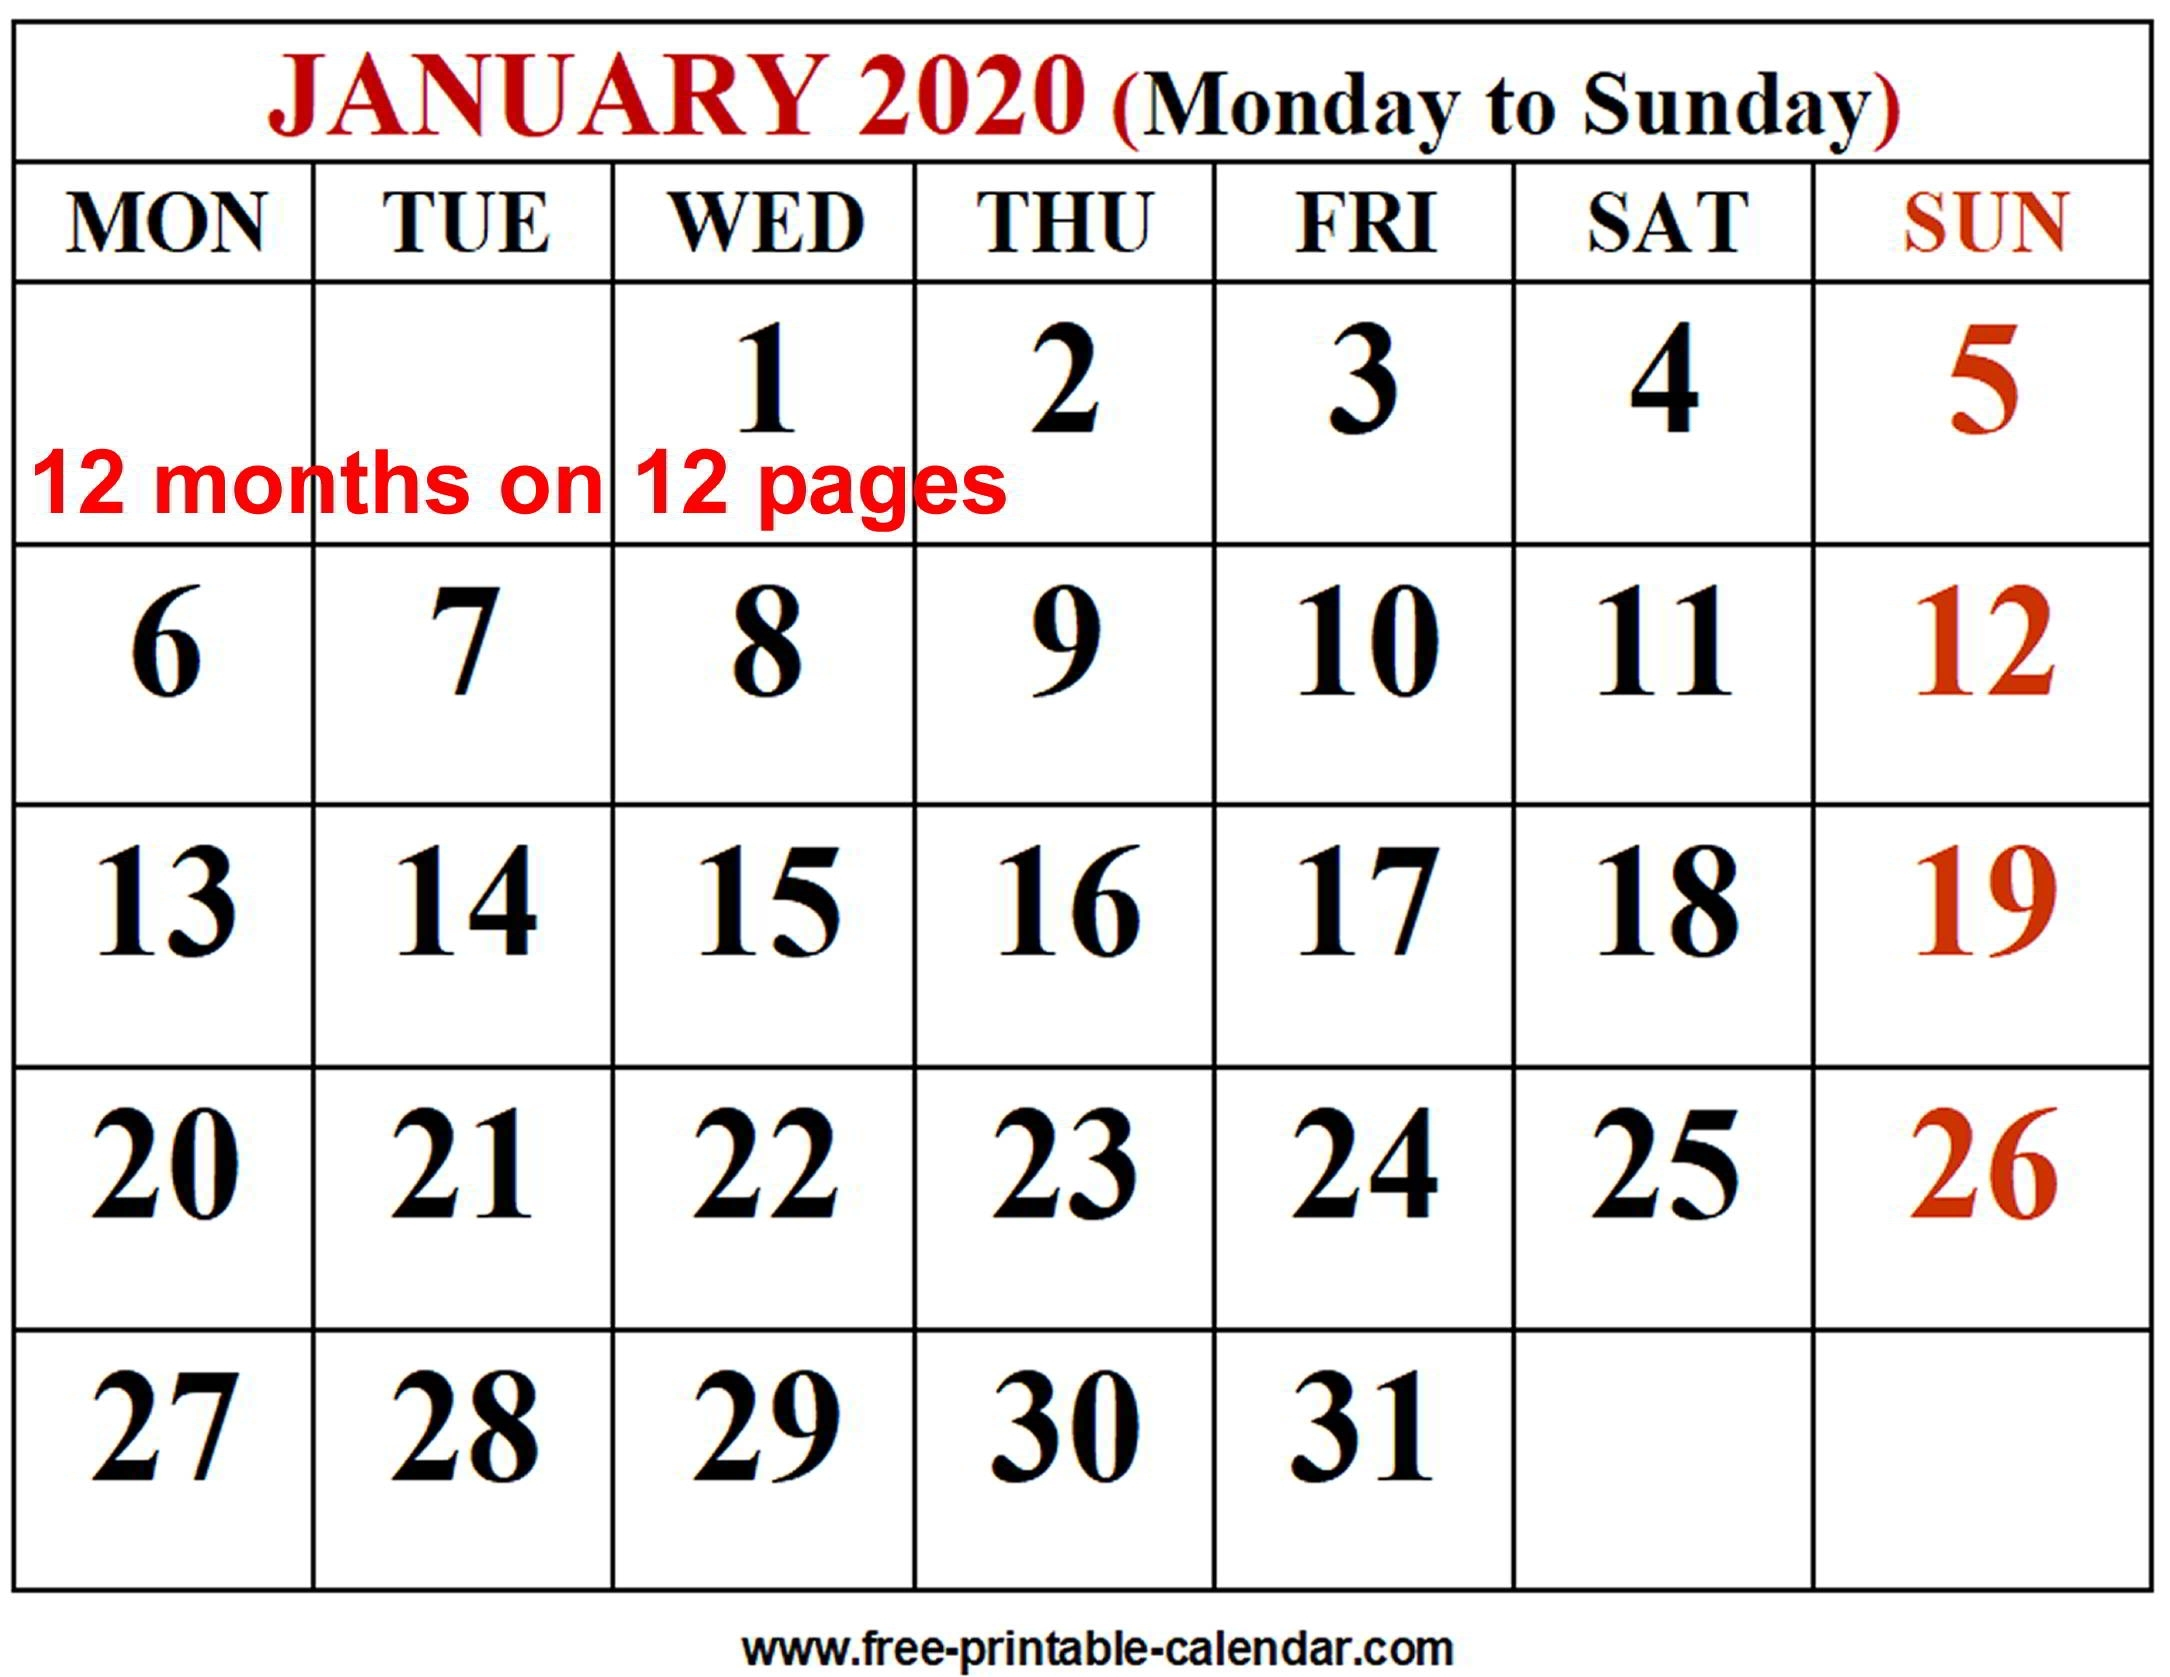 2020 Calendar Template - Free-Printable-Calendar regarding Printable Monthly Calendar 2020 Free